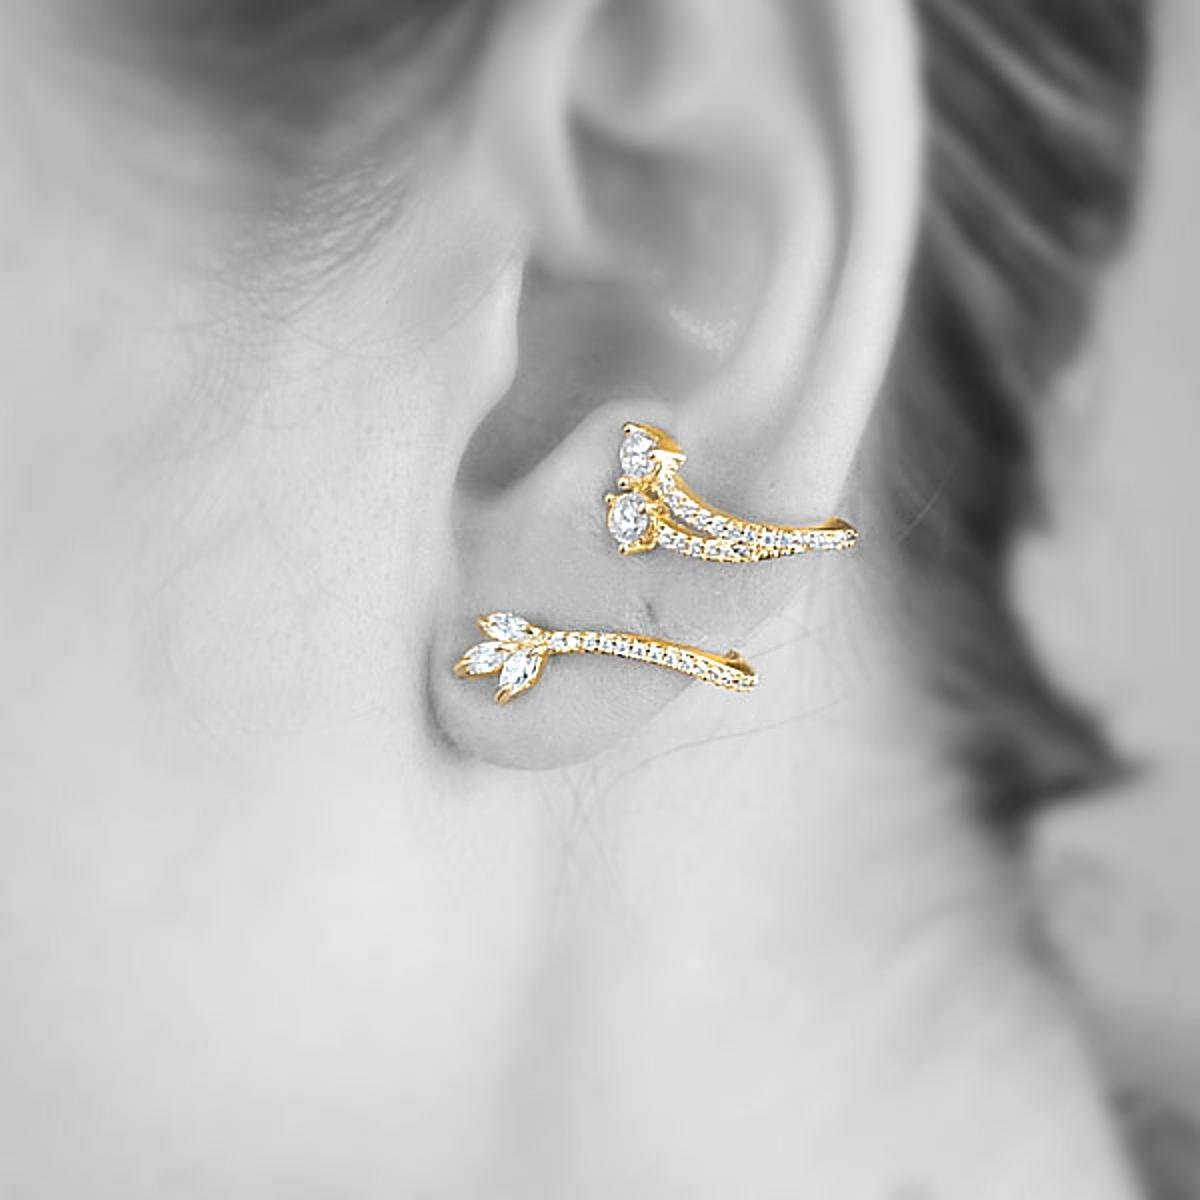 Brinco Ear Cuff Ramo Semijoia em Ouro 18K com Zircônia Branca Brilhante  - SOLOYOU